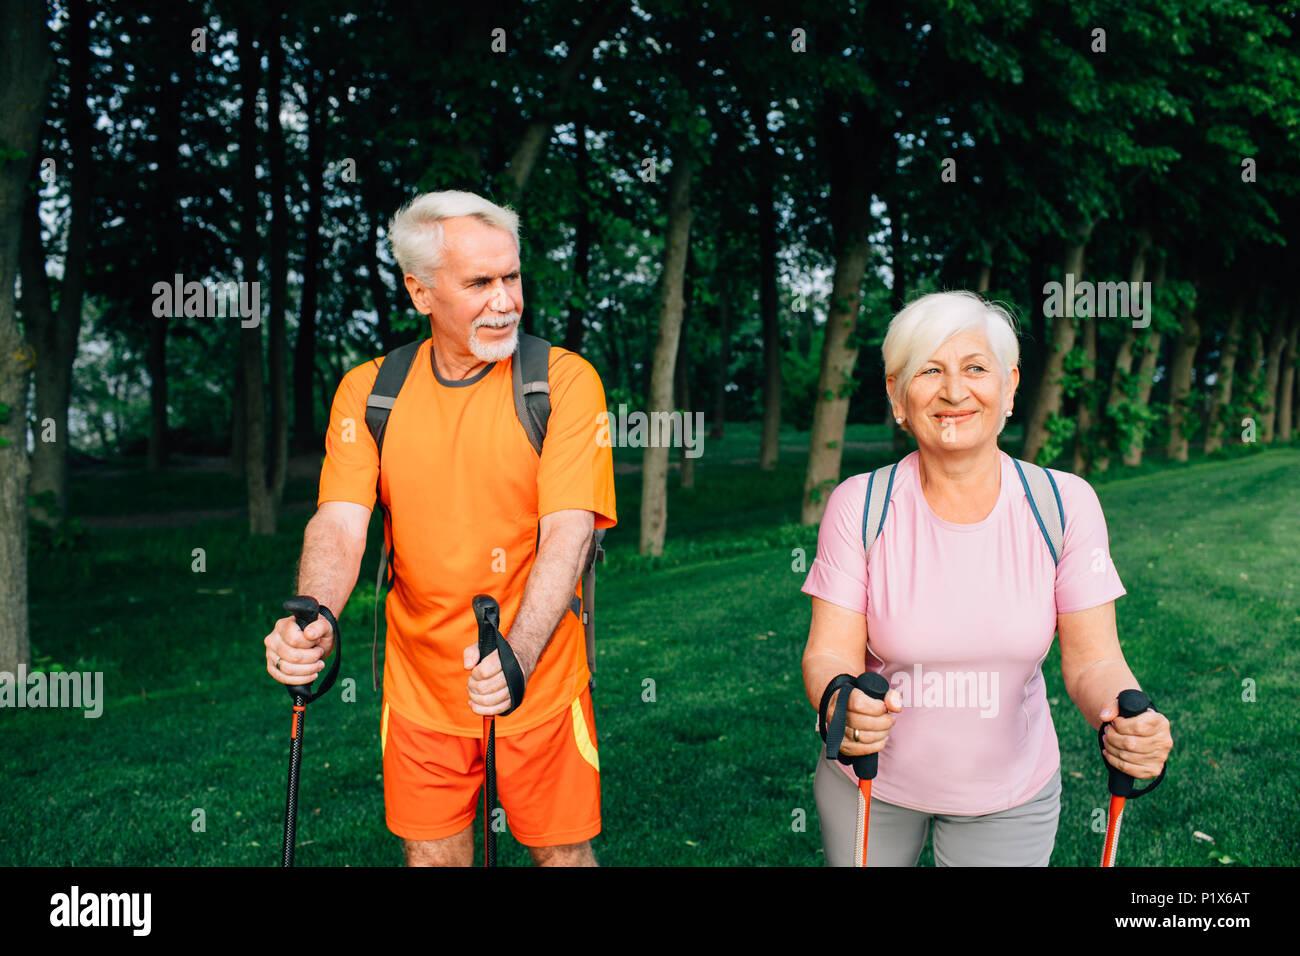 Senior couple hiking below trees, active lifestyles - Stock Image